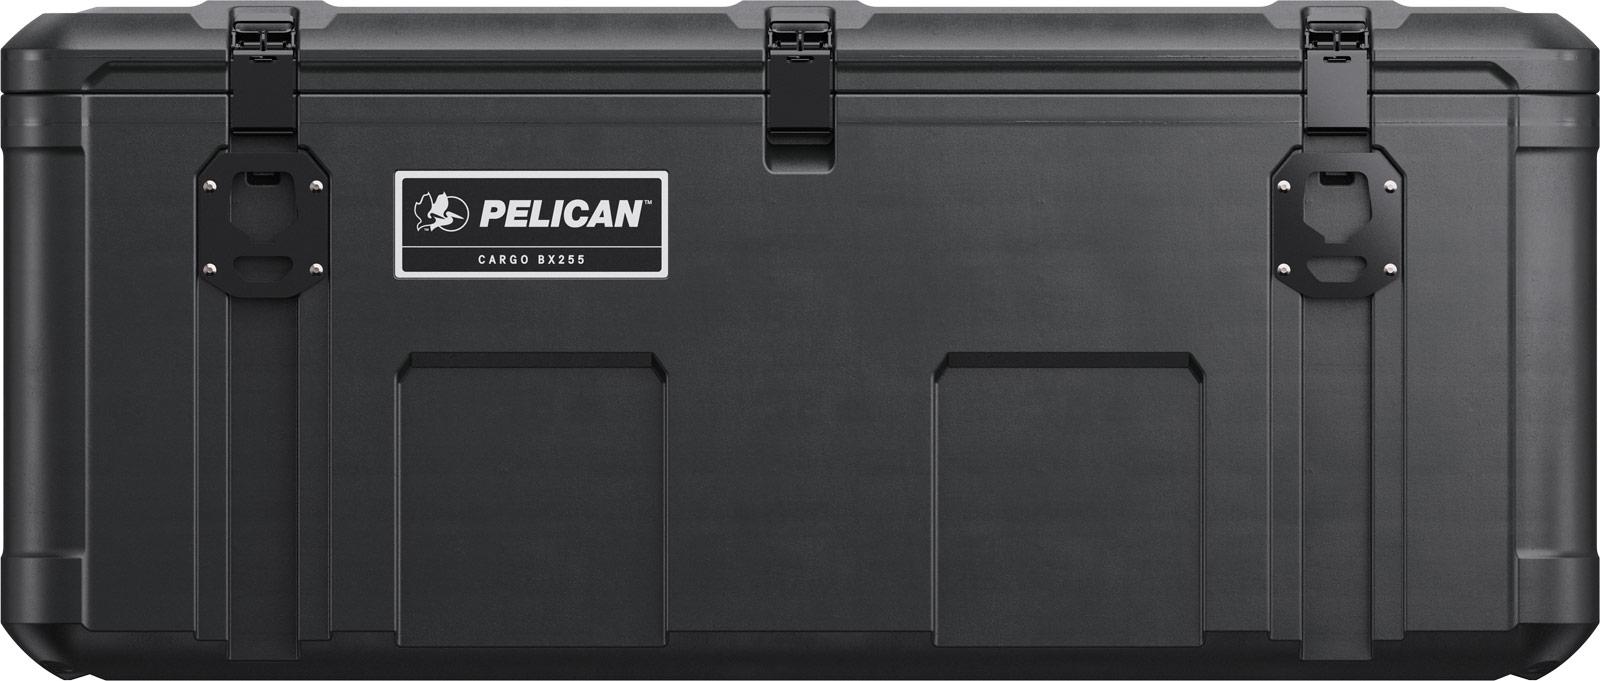 peican cargo bx255 carrier case